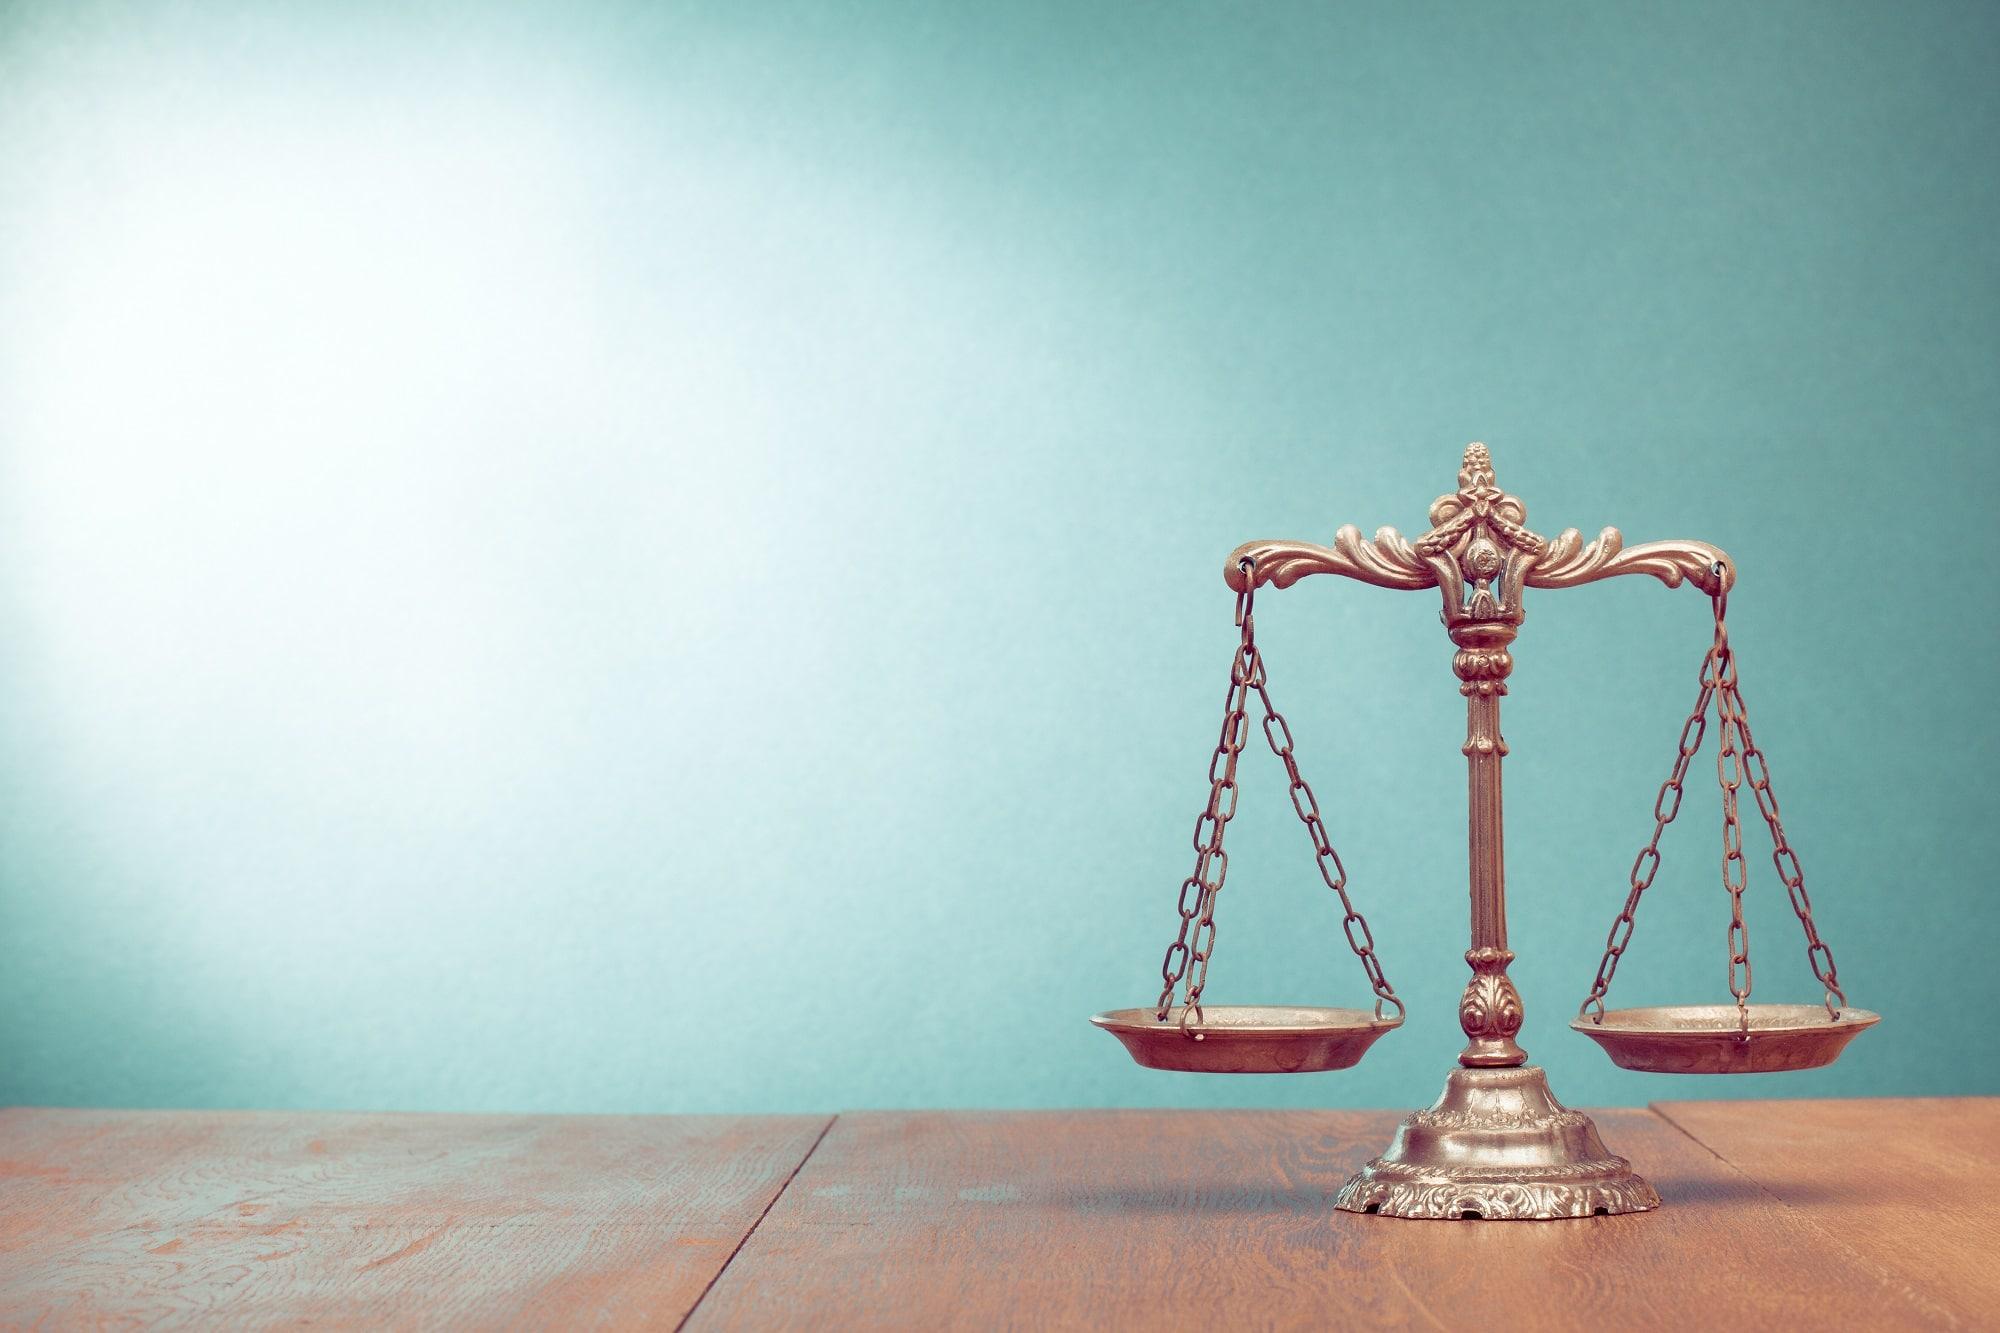 HECM vs HELOC vs Home Equity Loans